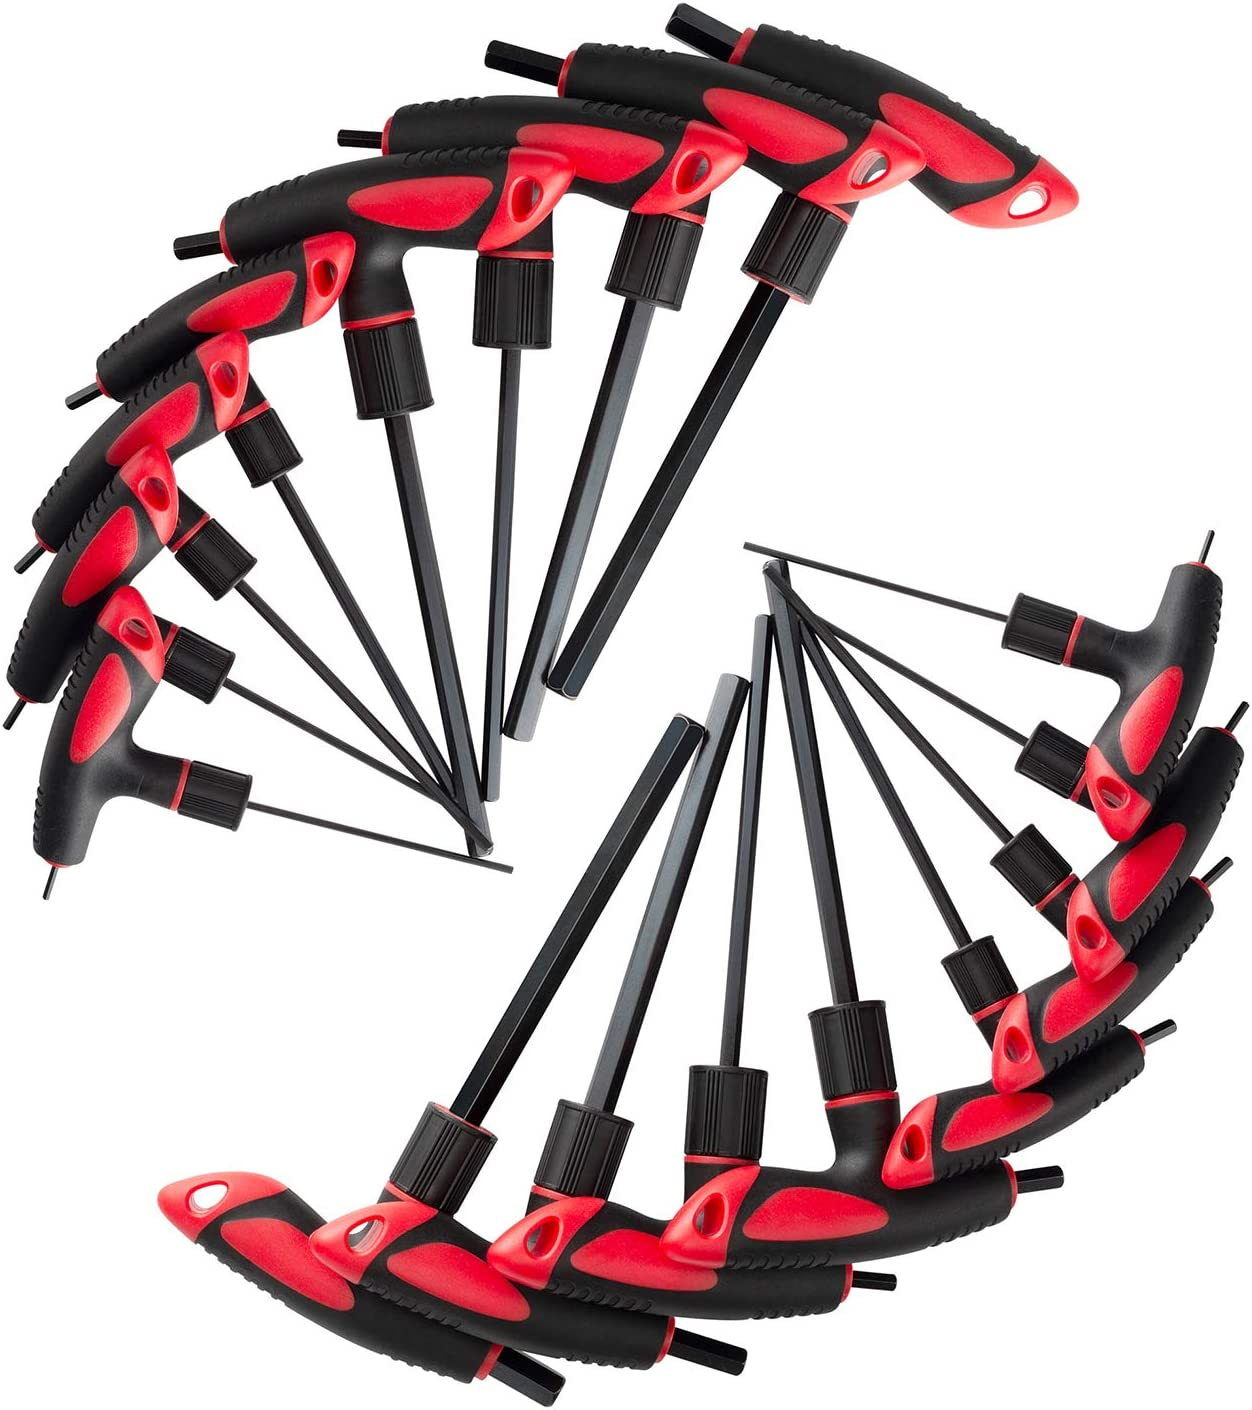 Lichamp Standard Thandle Tee Handle Allen Hex Key Set